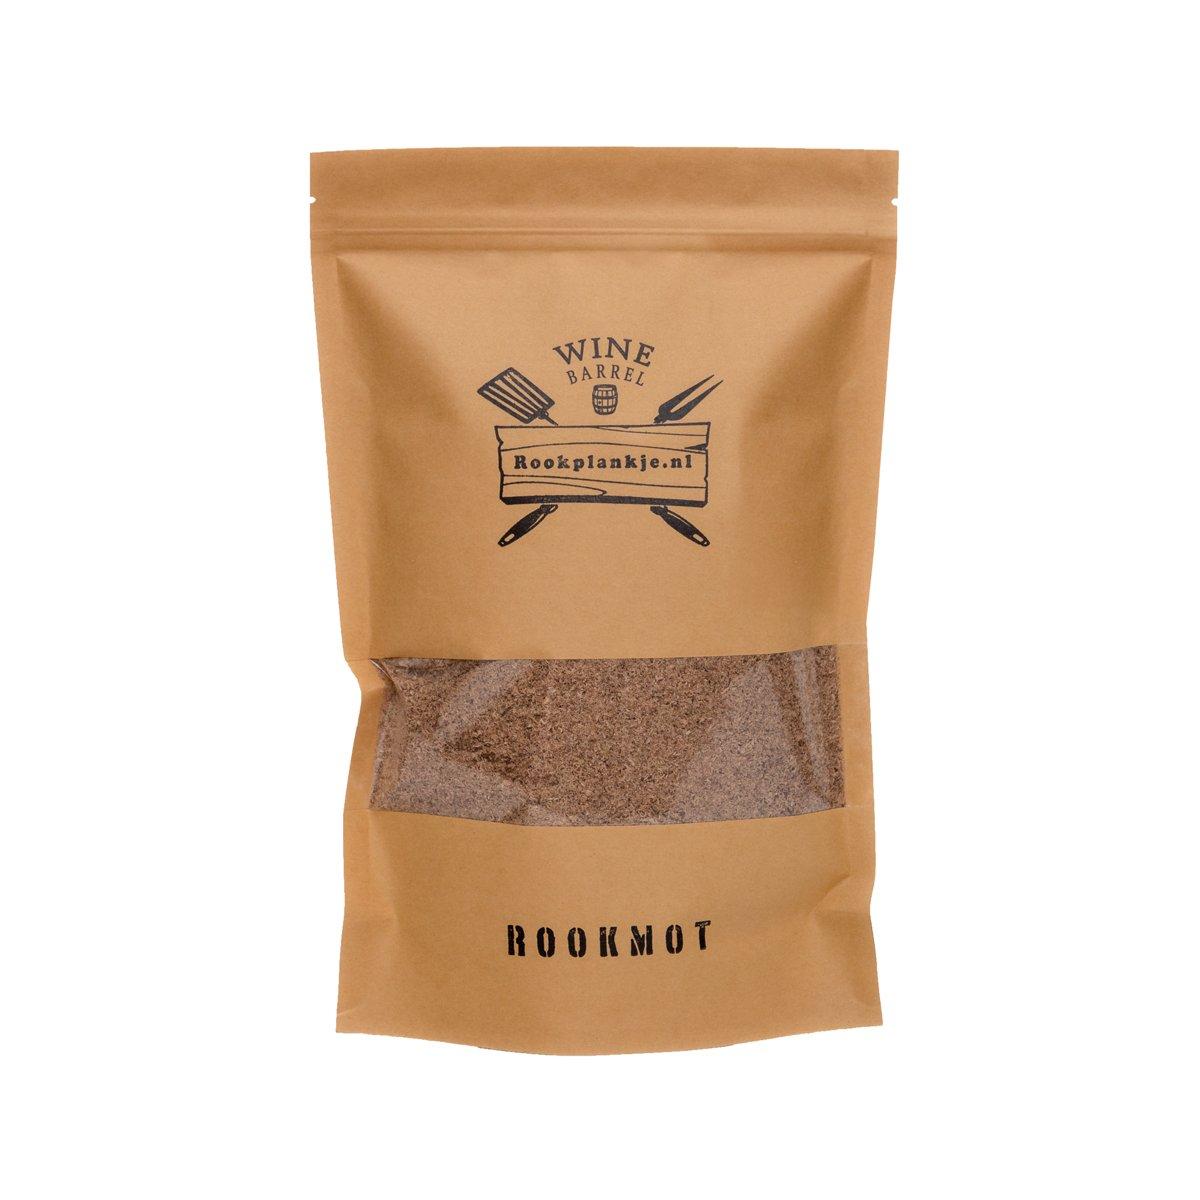 Rookmot Wine Barrel 1,5 L kopen